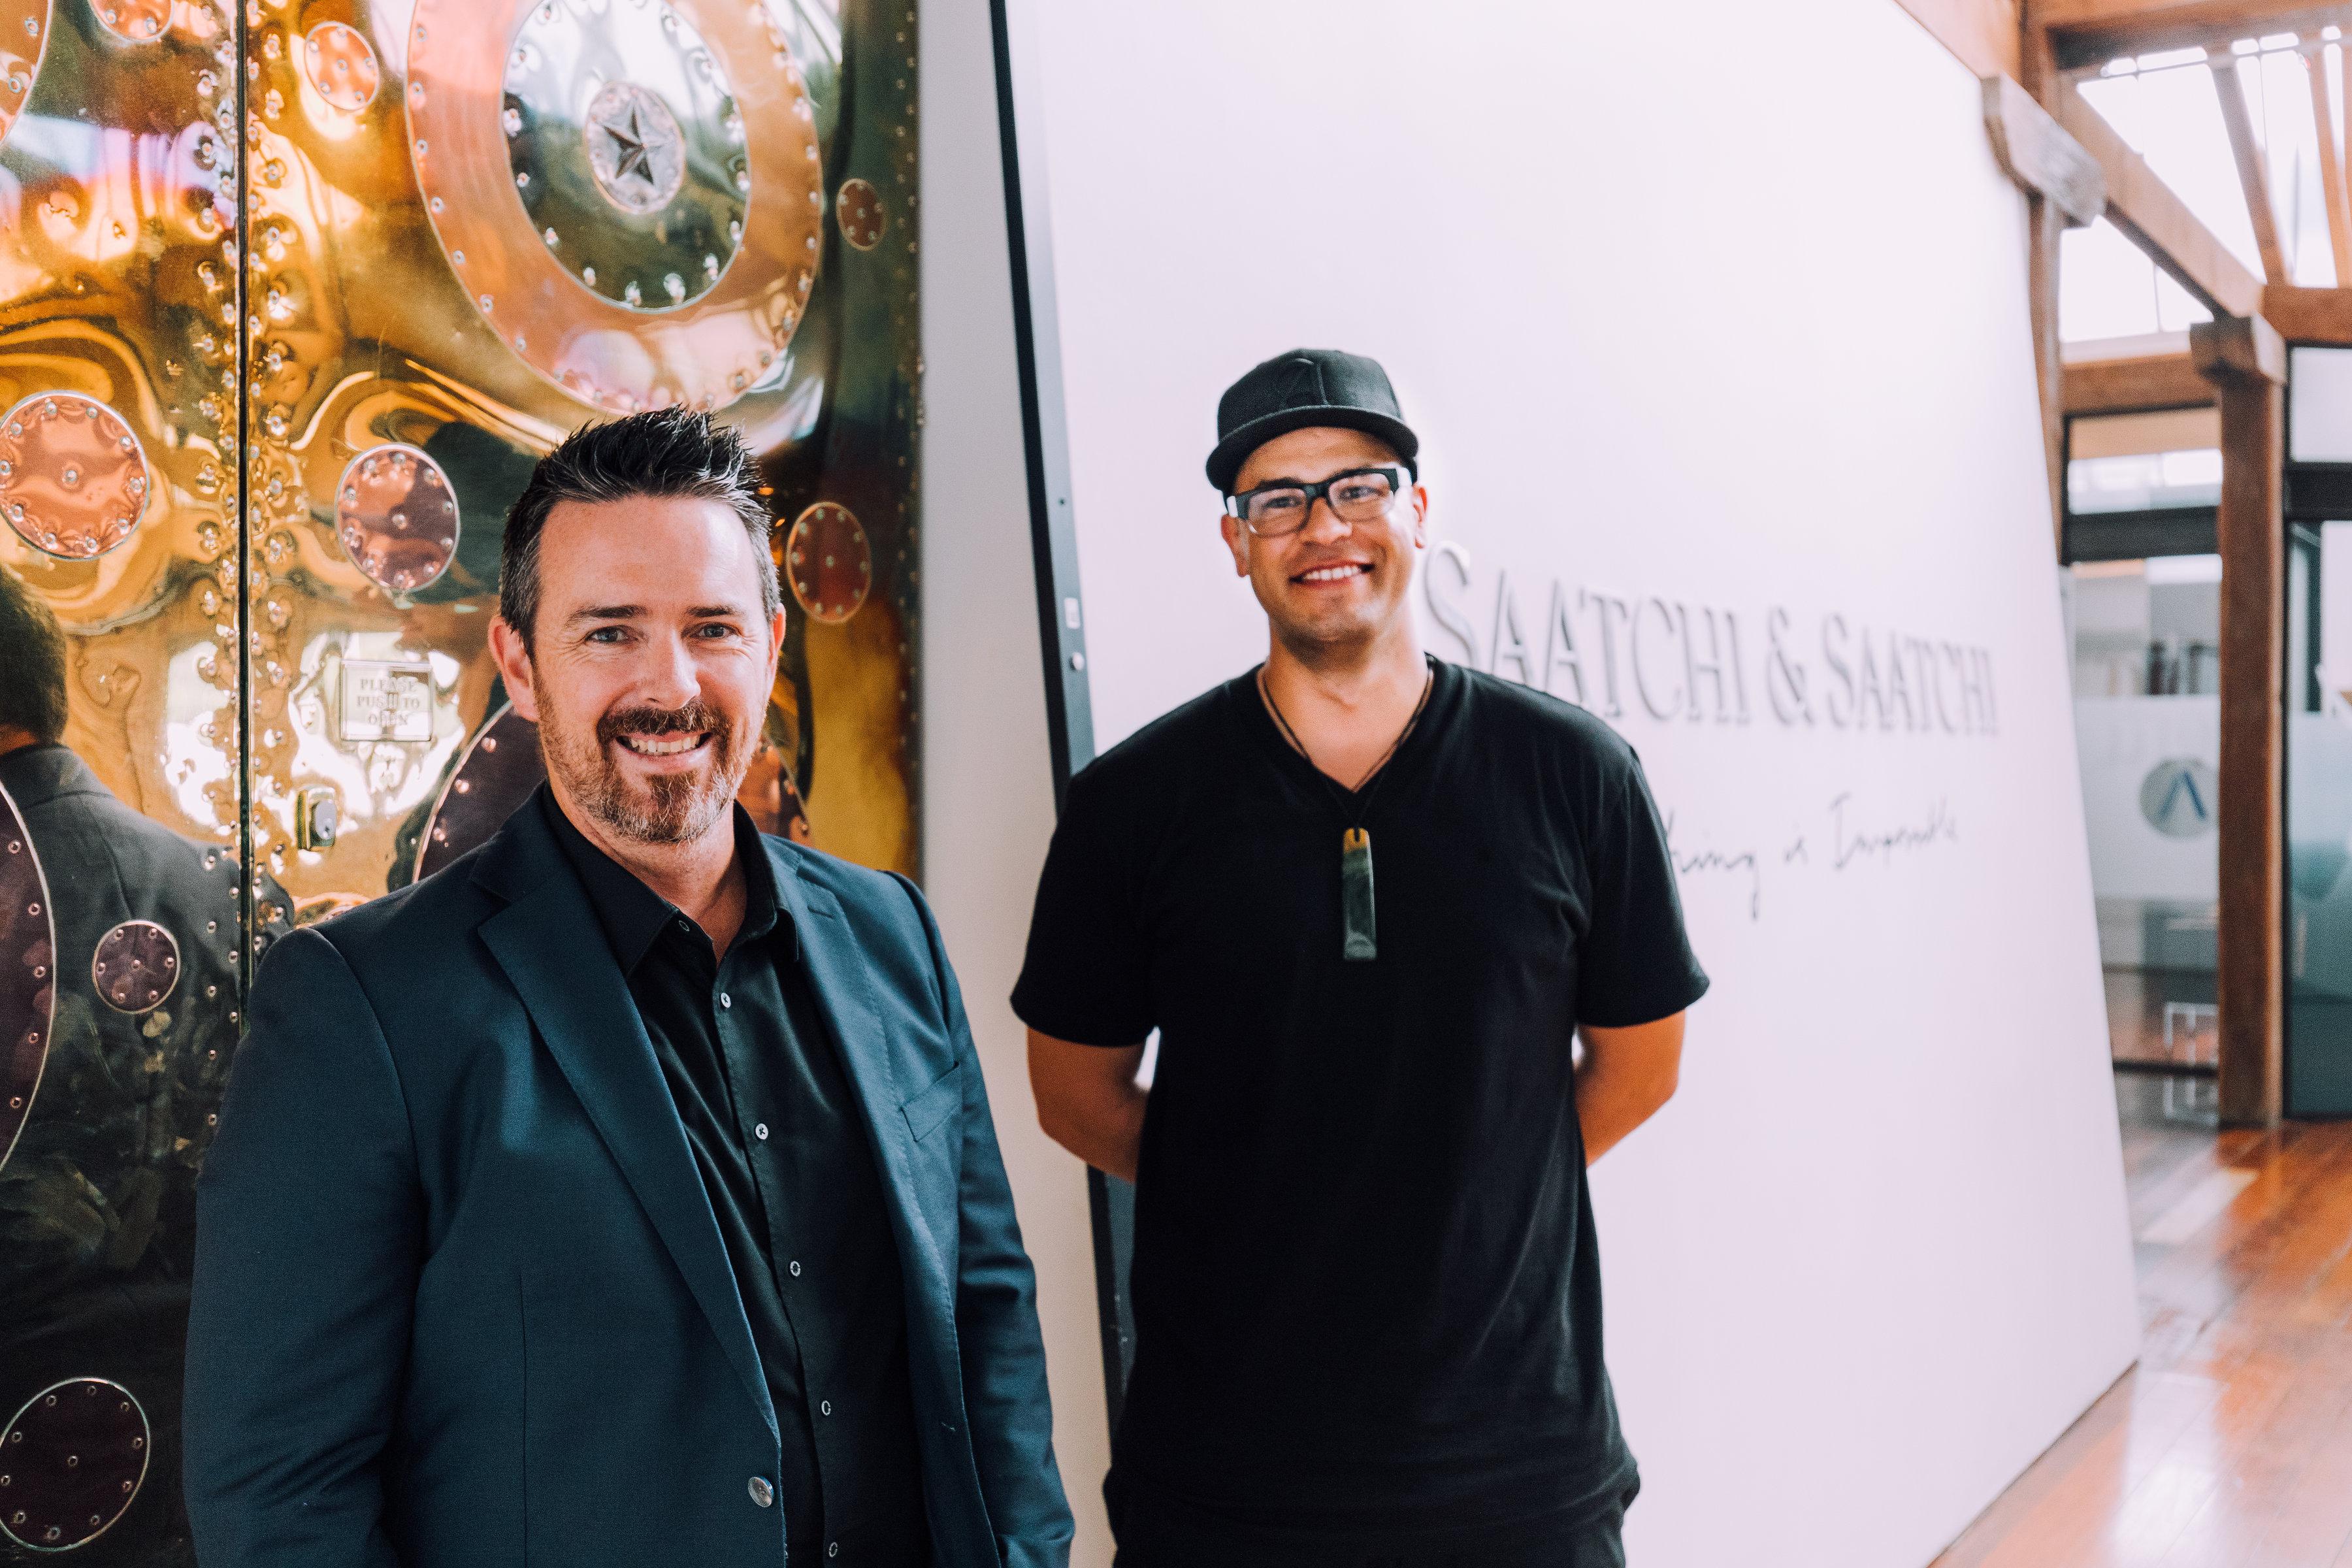 NZ Content Agency Frontside and Founder Robett Hollis Join Saatchi & Saatchi New Zealand